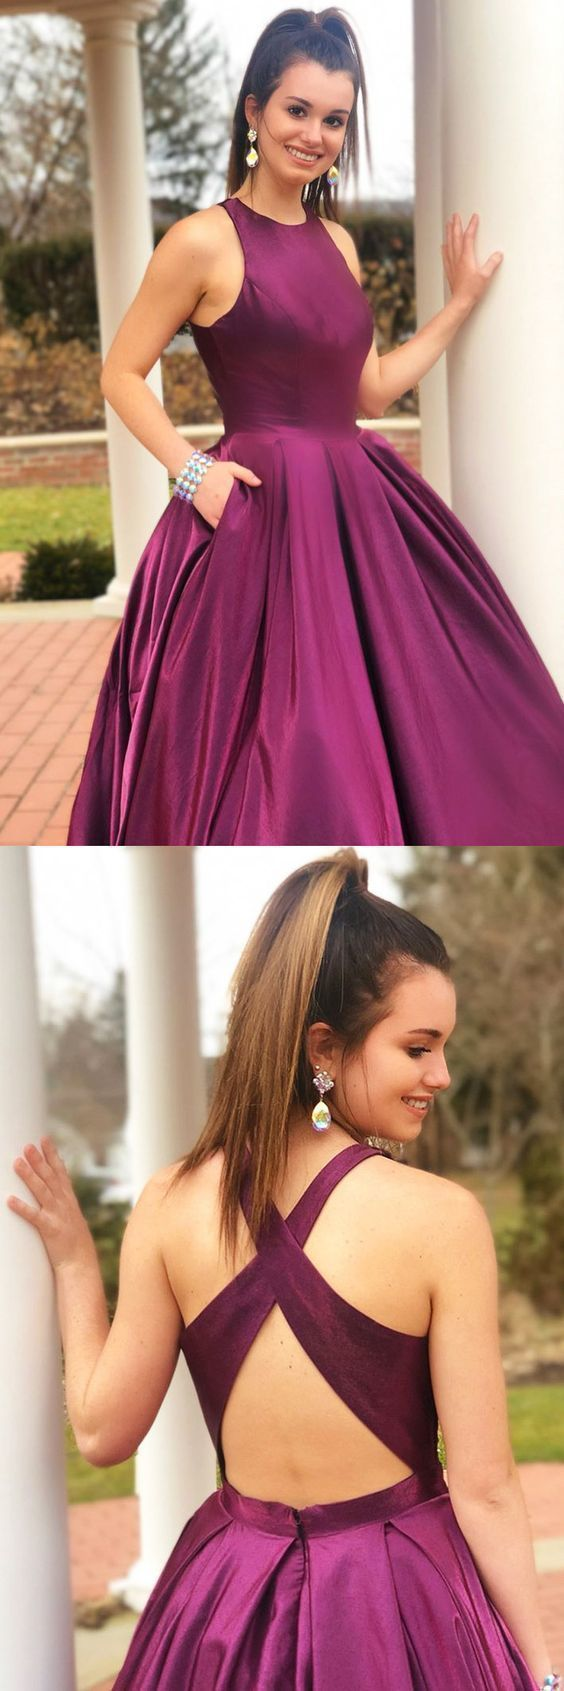 Simply Elegant Grape Long Prom Dress with Pockets